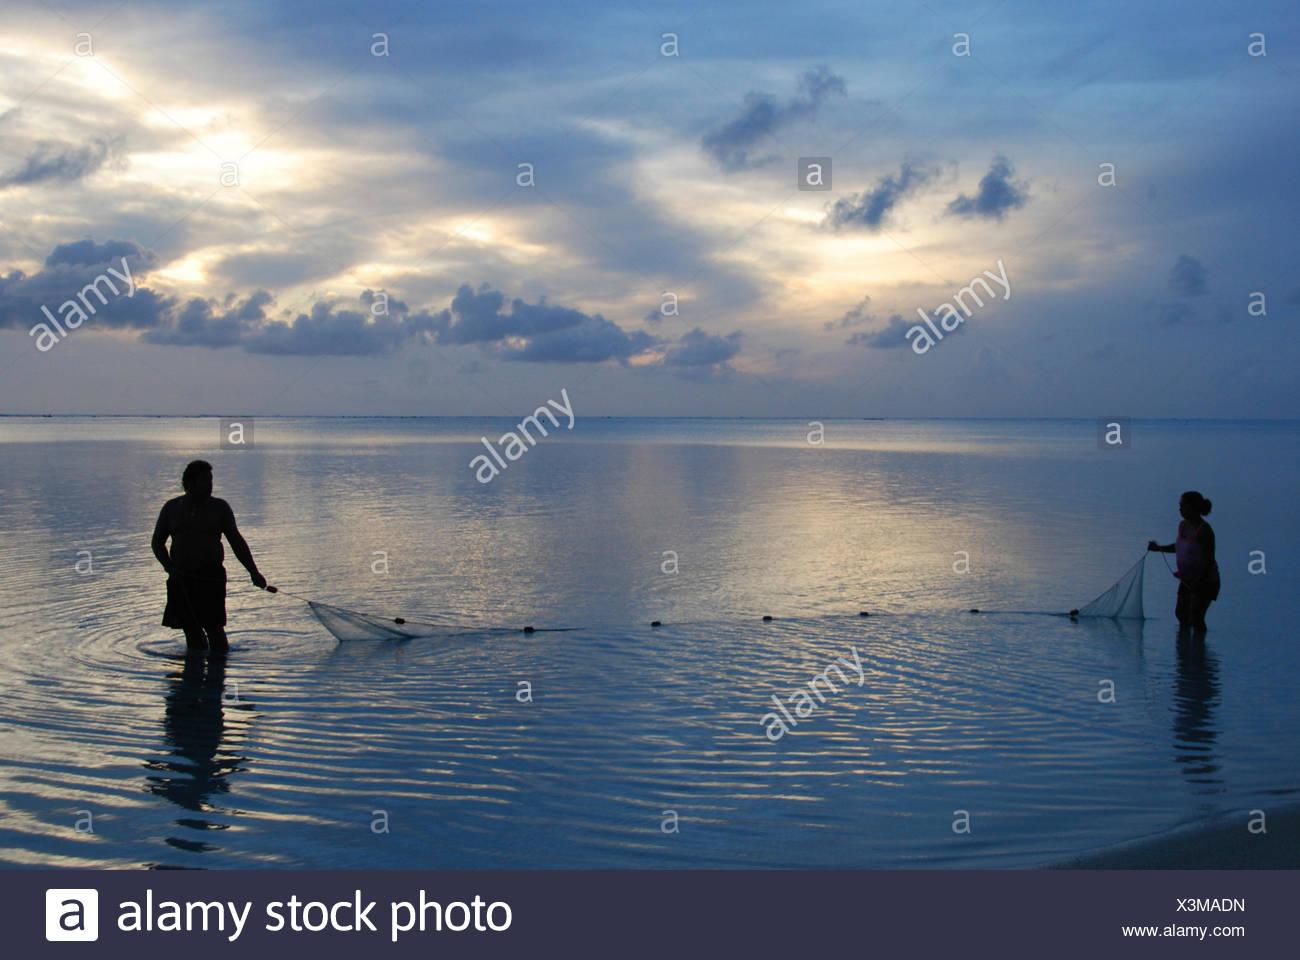 Fishermen at sunset, Aitutaki Atoll, Cook Islands, Pacific Ocean - Stock Image